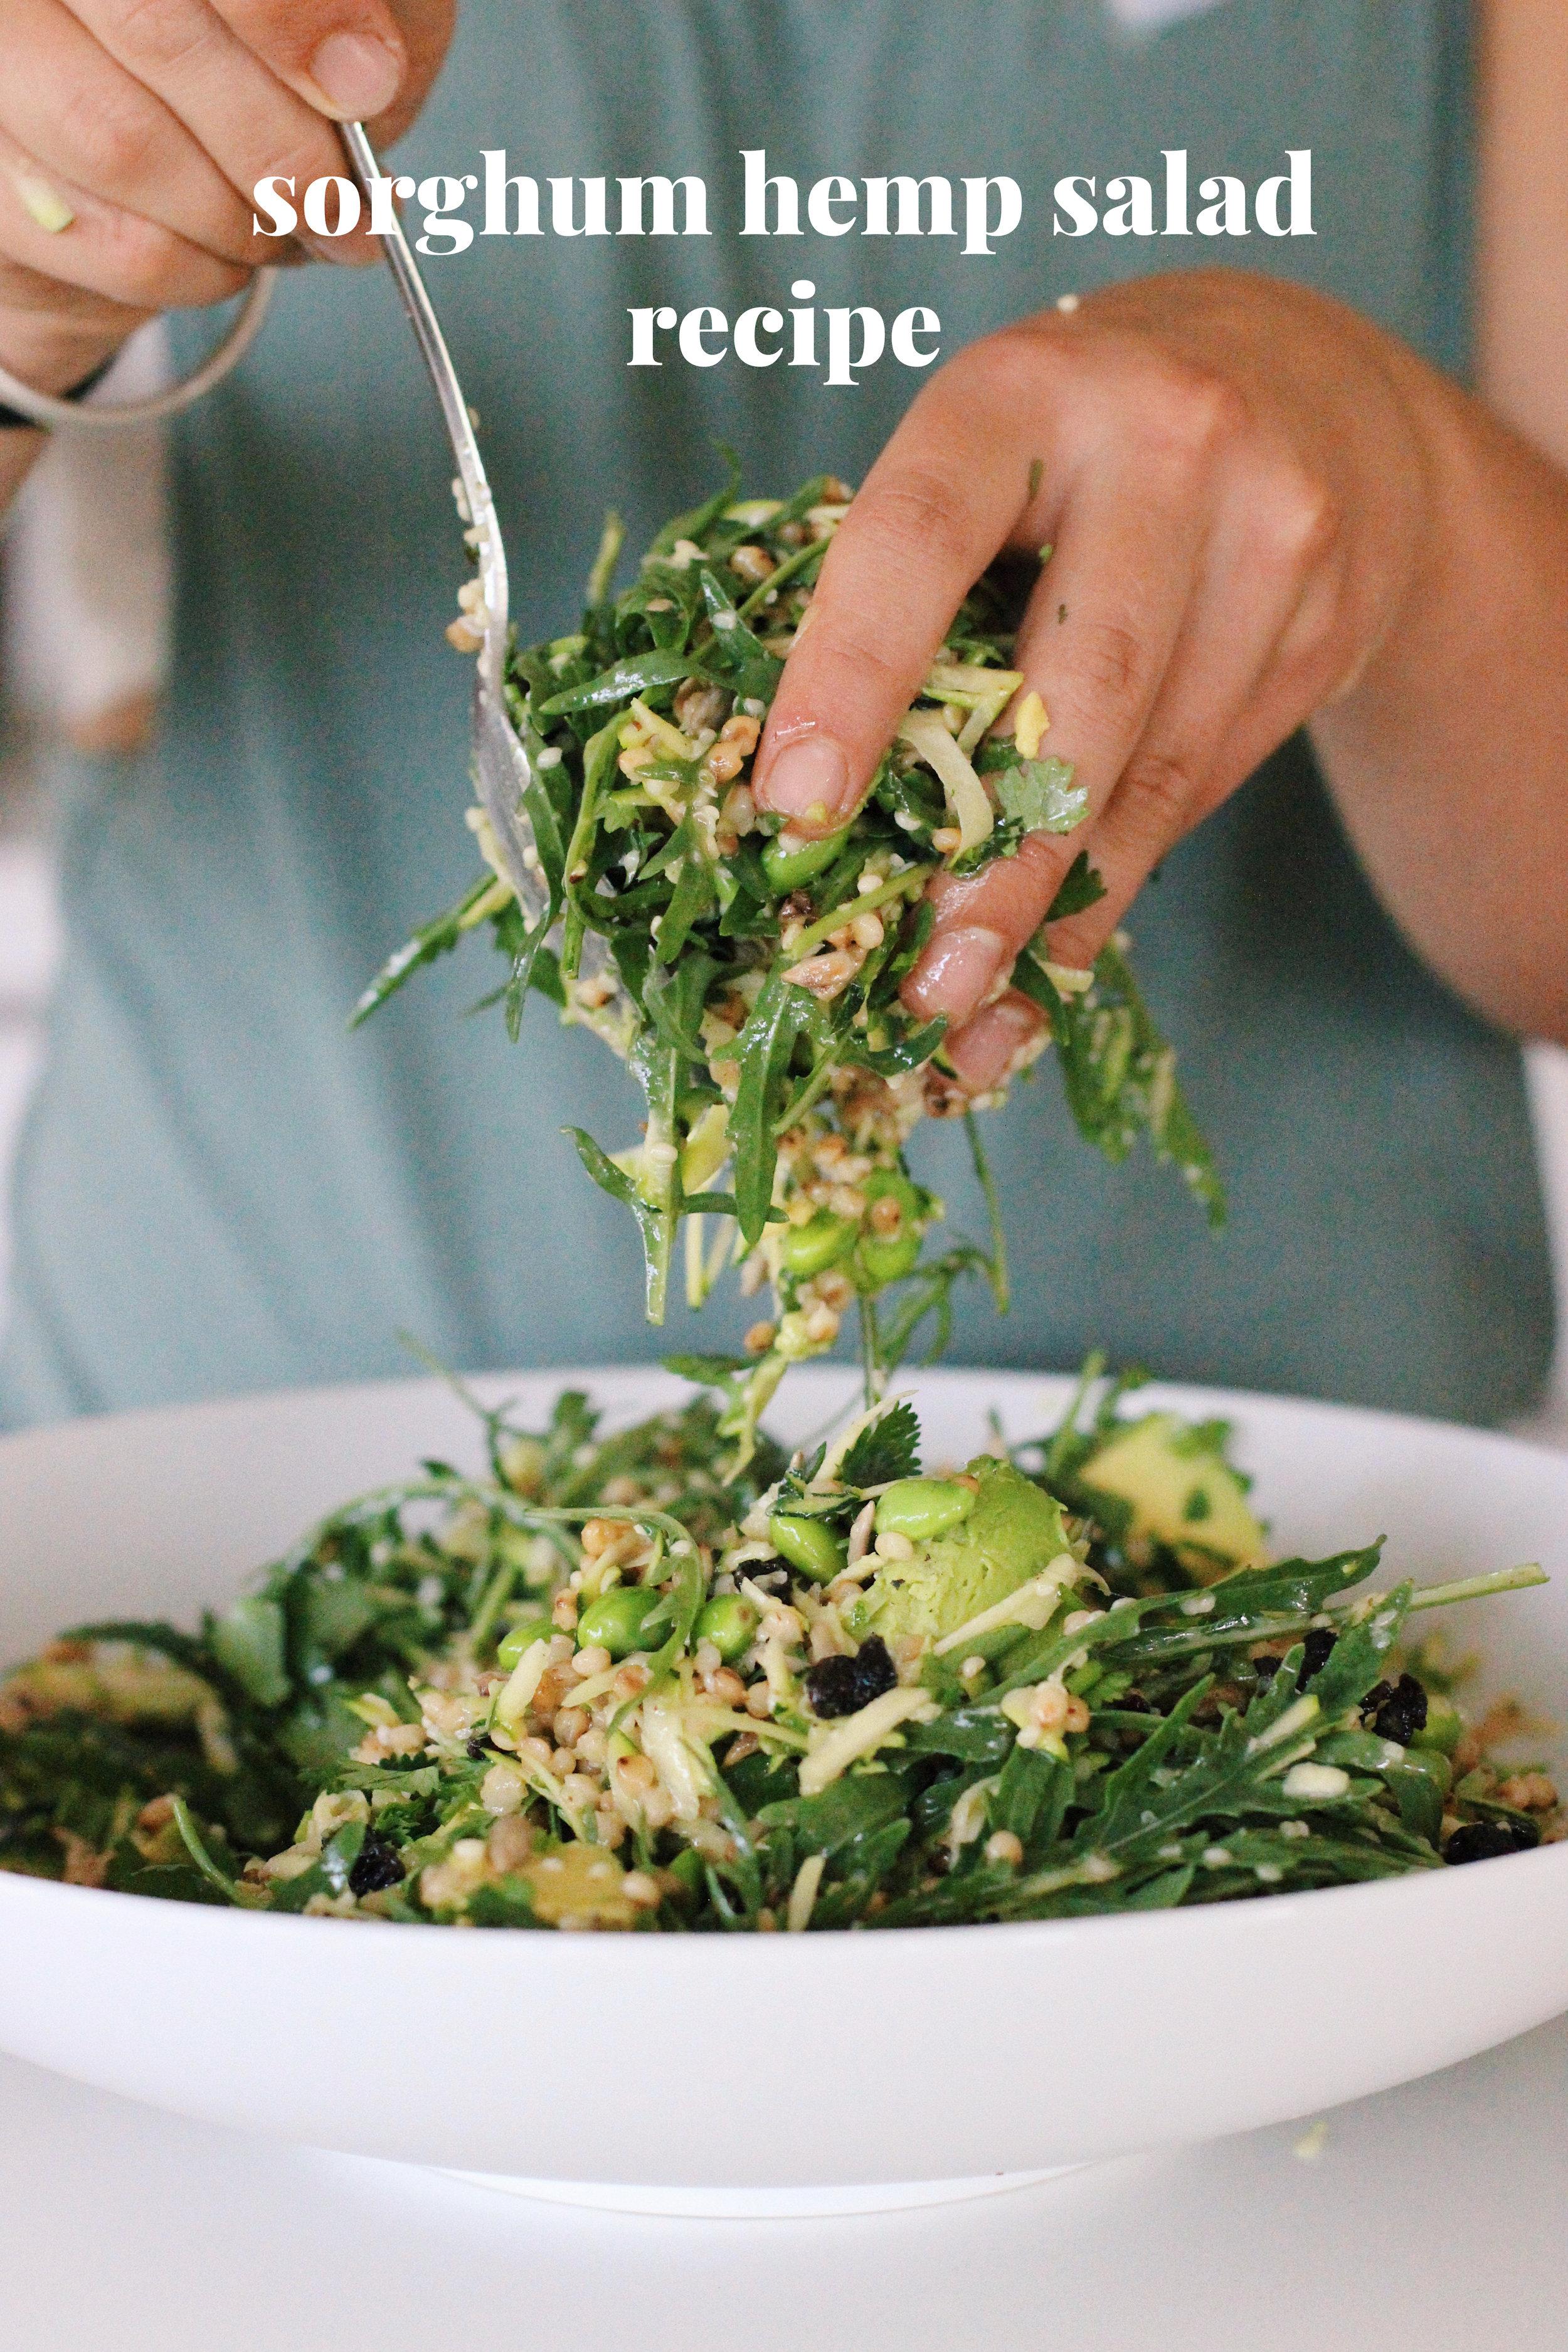 sorghum hemp salad.jpg